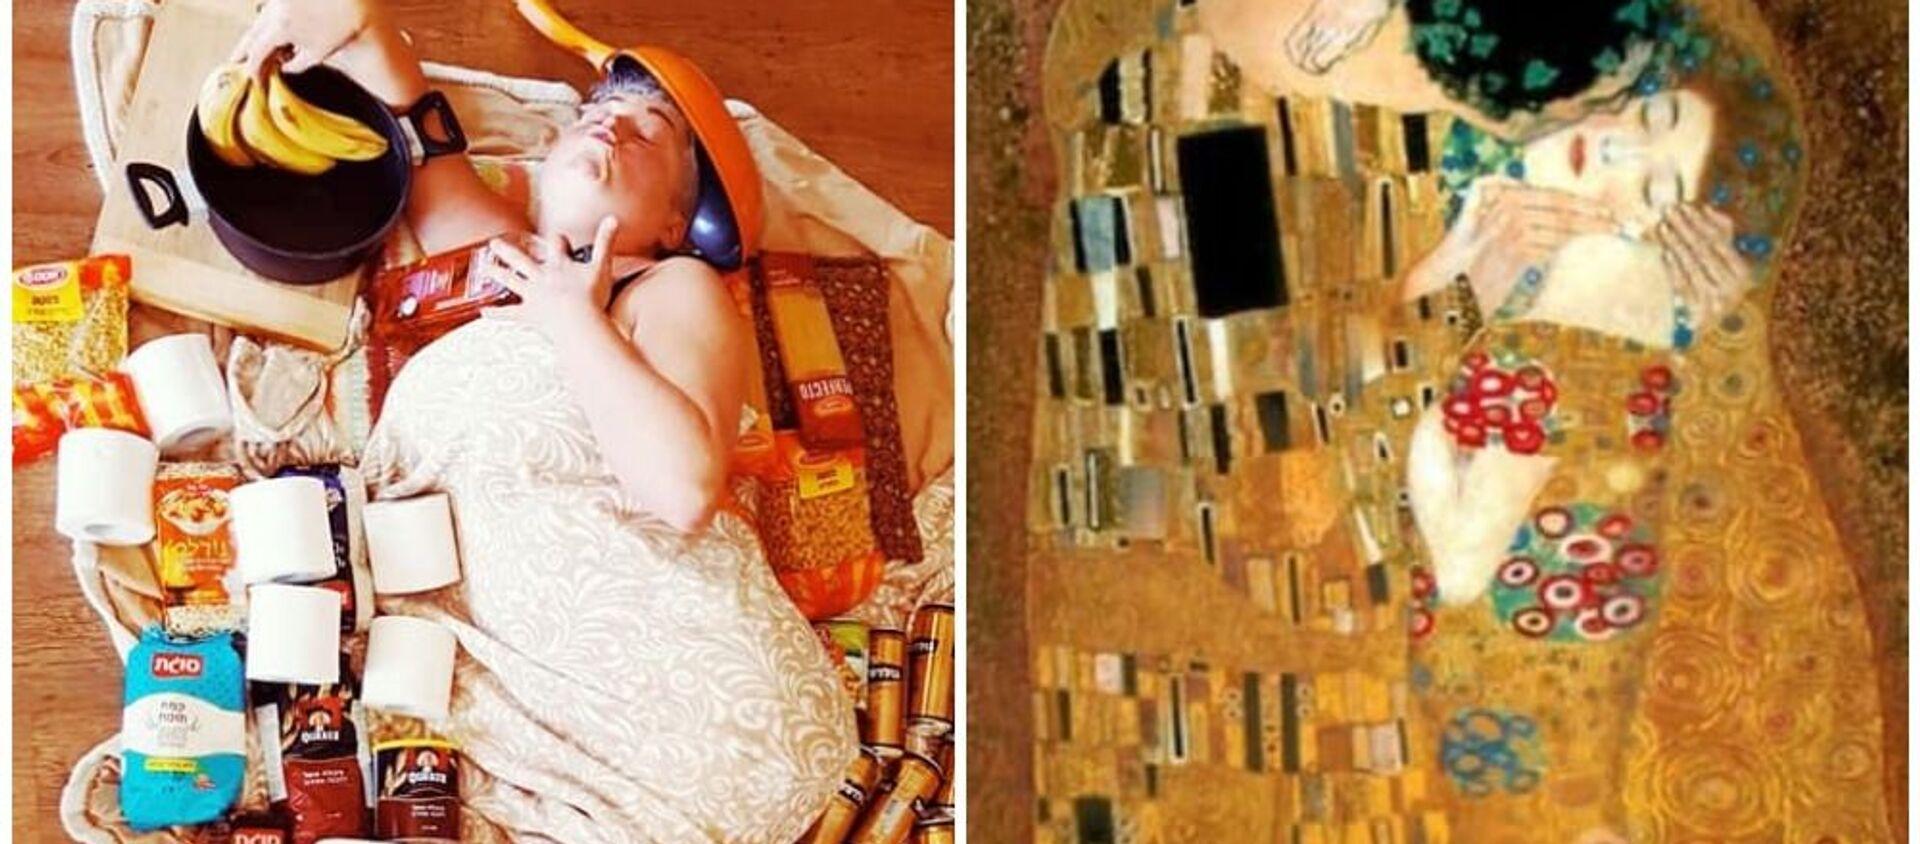 Il bacio di Gustav Klimt, 1907-08 - Sputnik Italia, 1920, 08.04.2020